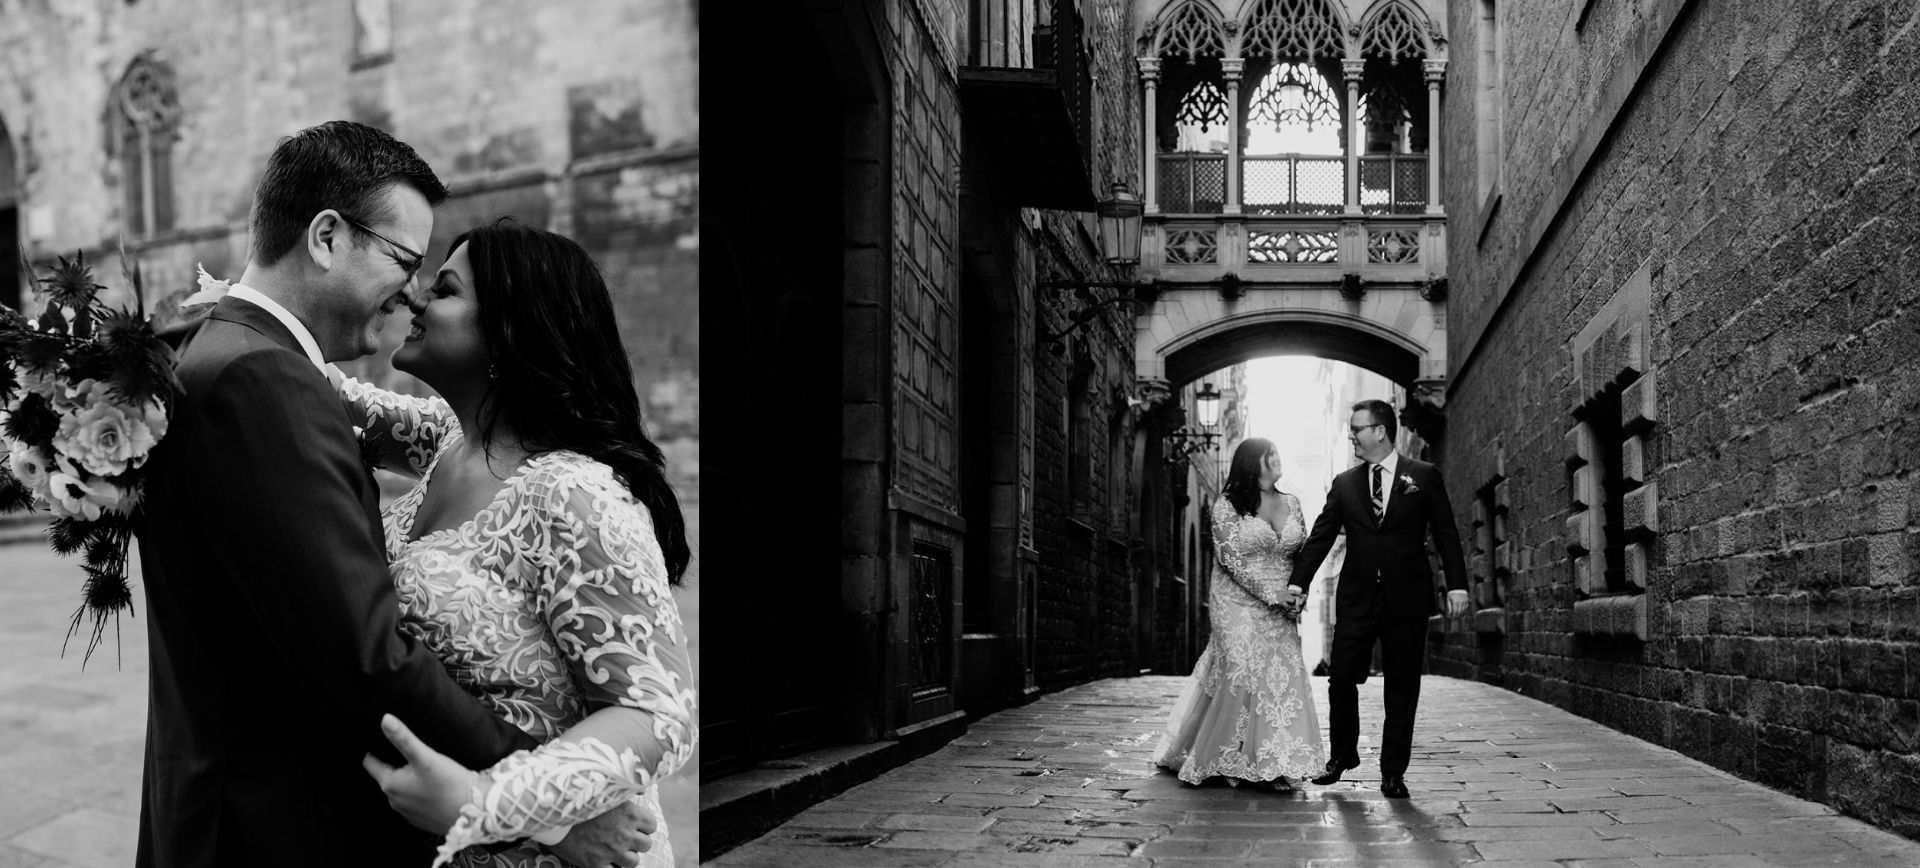 barcelona elopement package - gothic quarter wedding